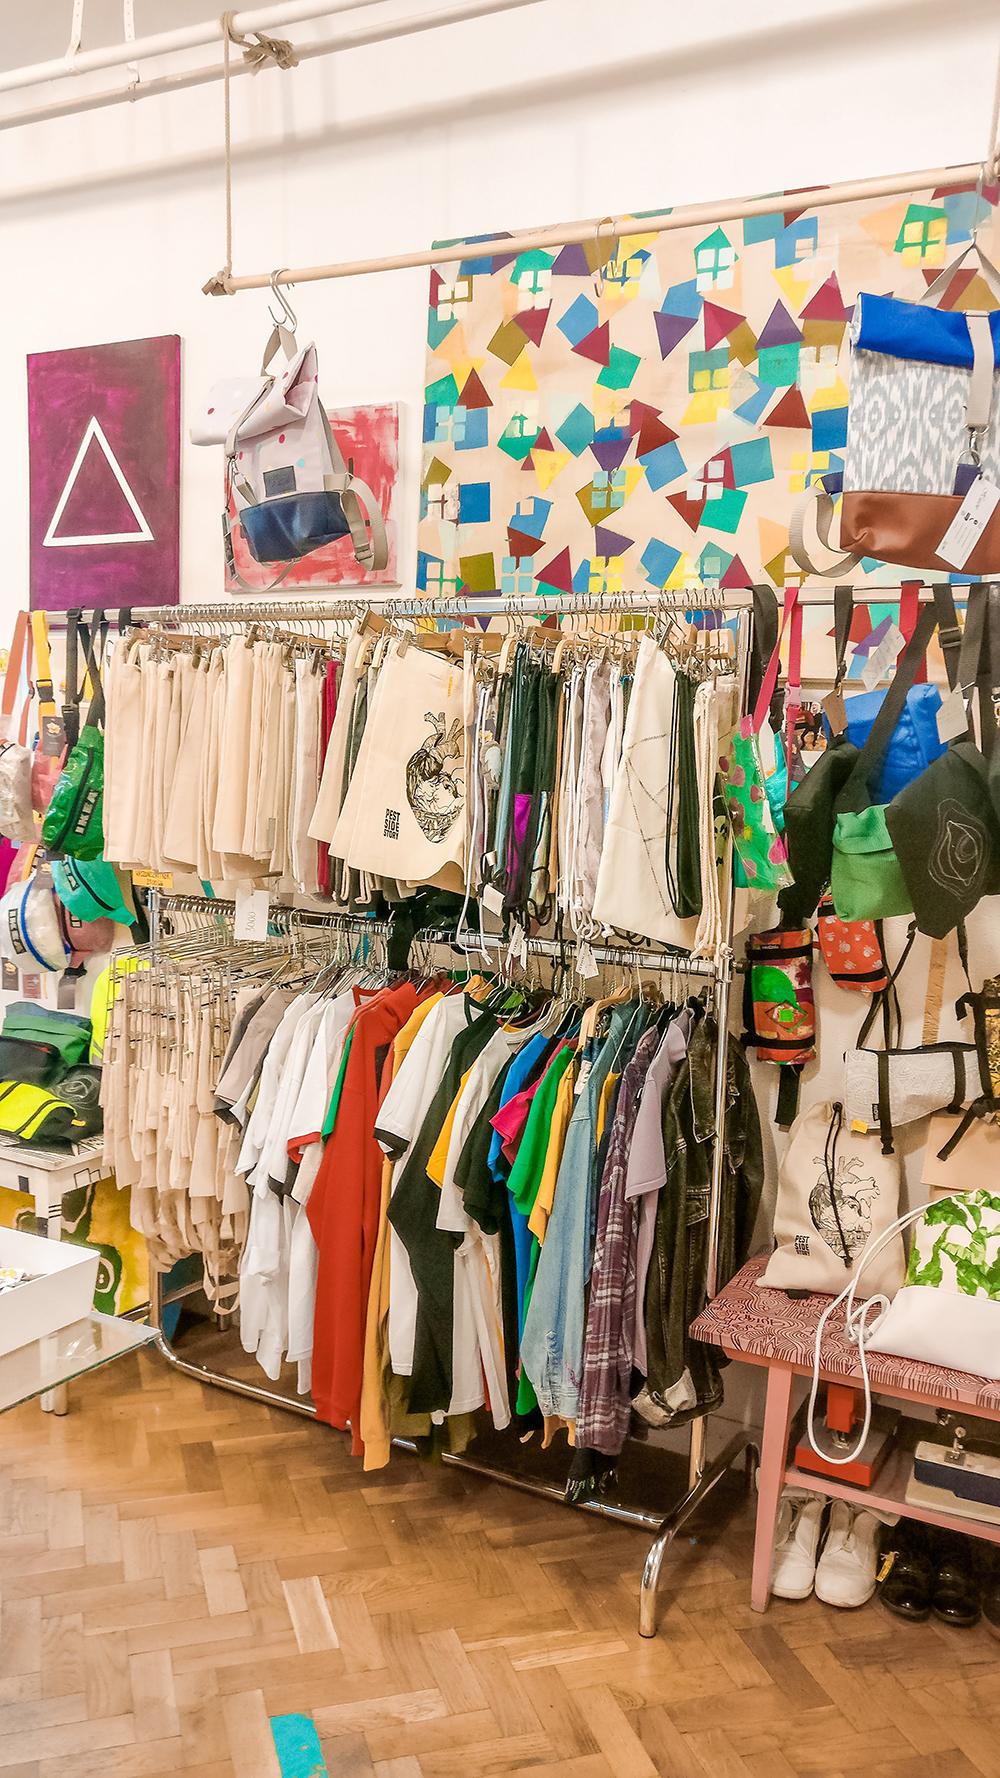 Szia+ (Szia Adománybolt) - Budapest design shop guide to best Hungarian souvenirs | Aliz's Wonderland